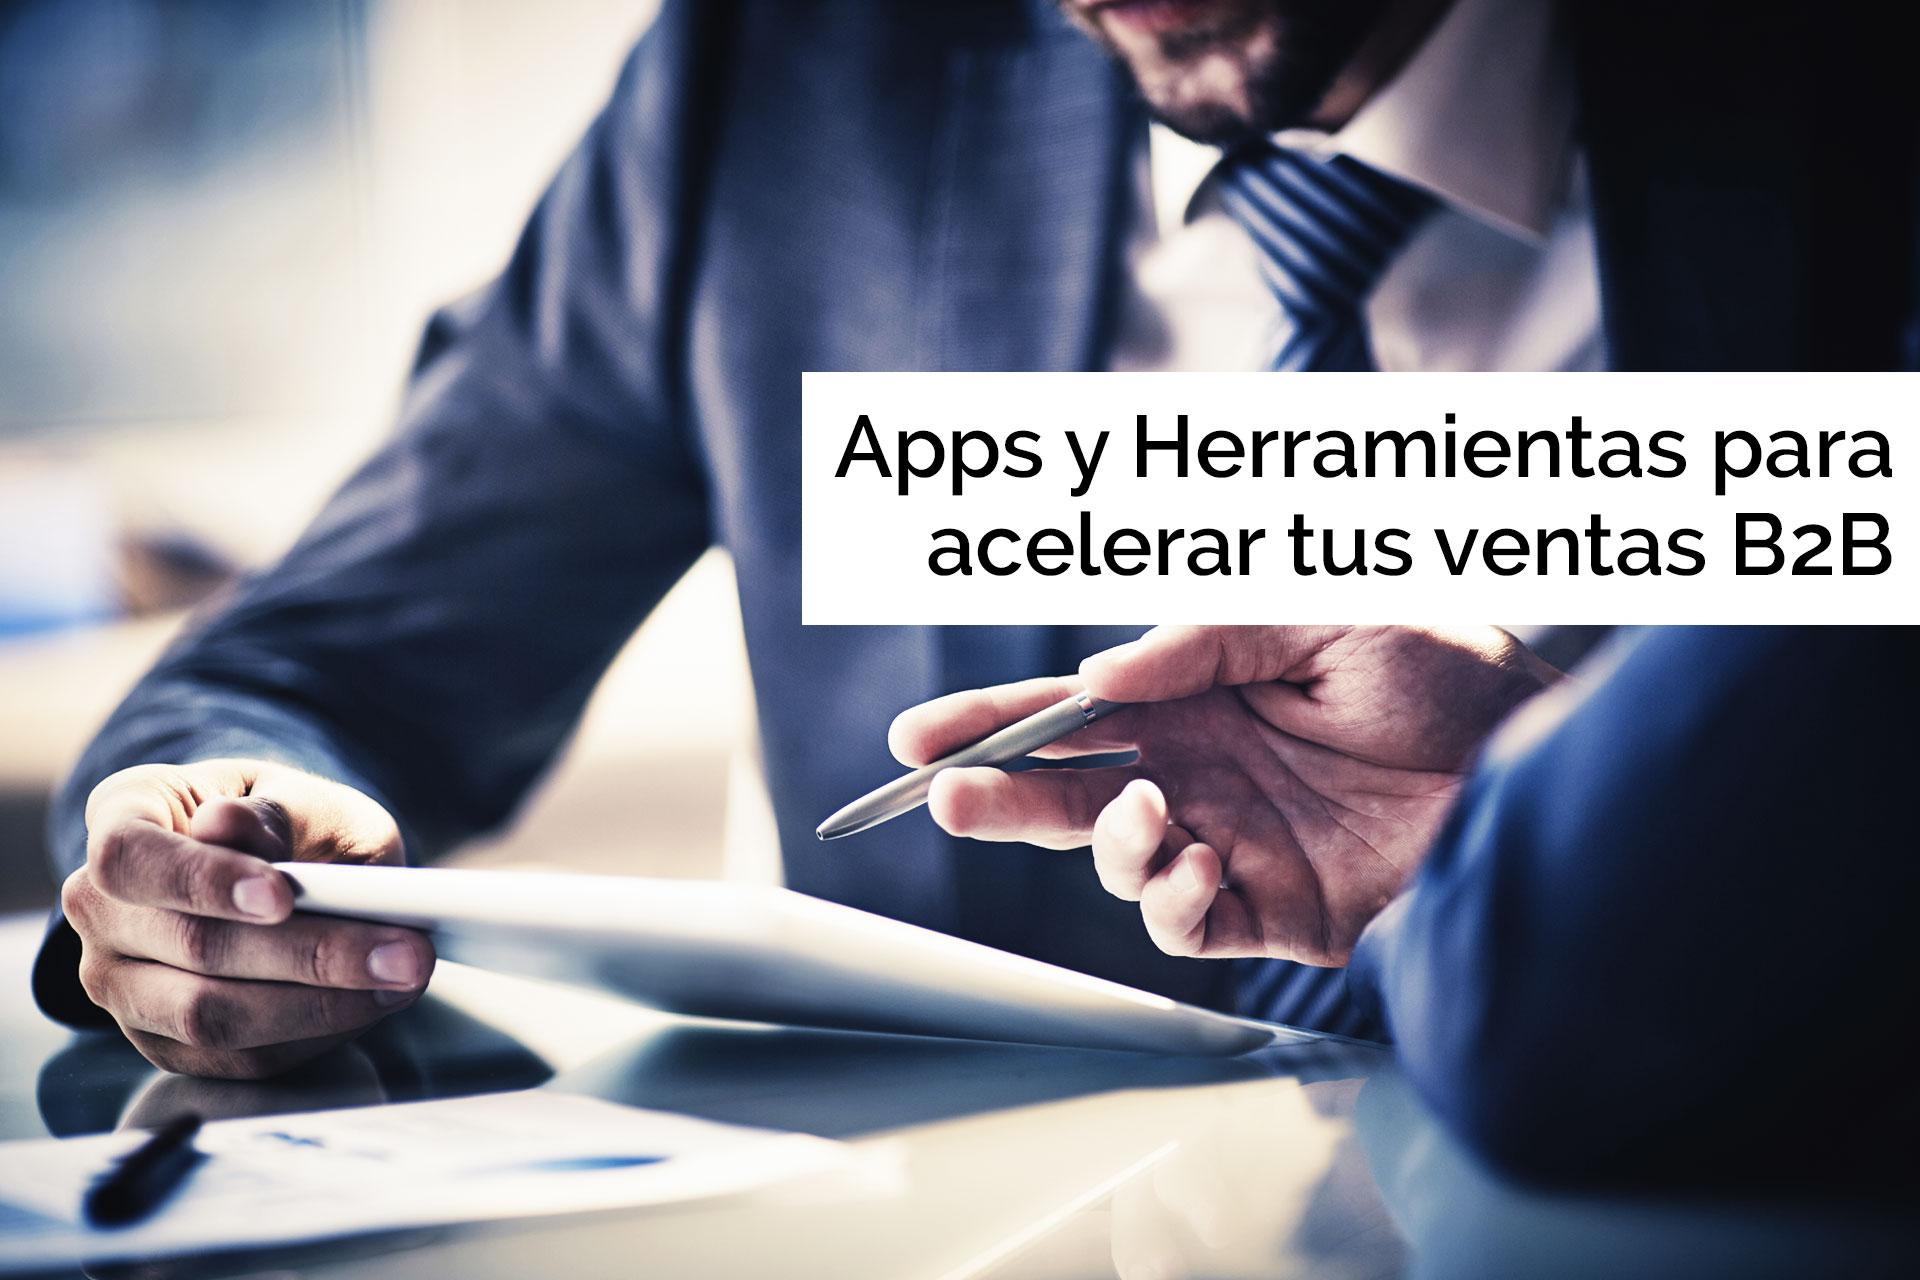 apps-herramientas-para-acelerar-ventas-b2b.jpg